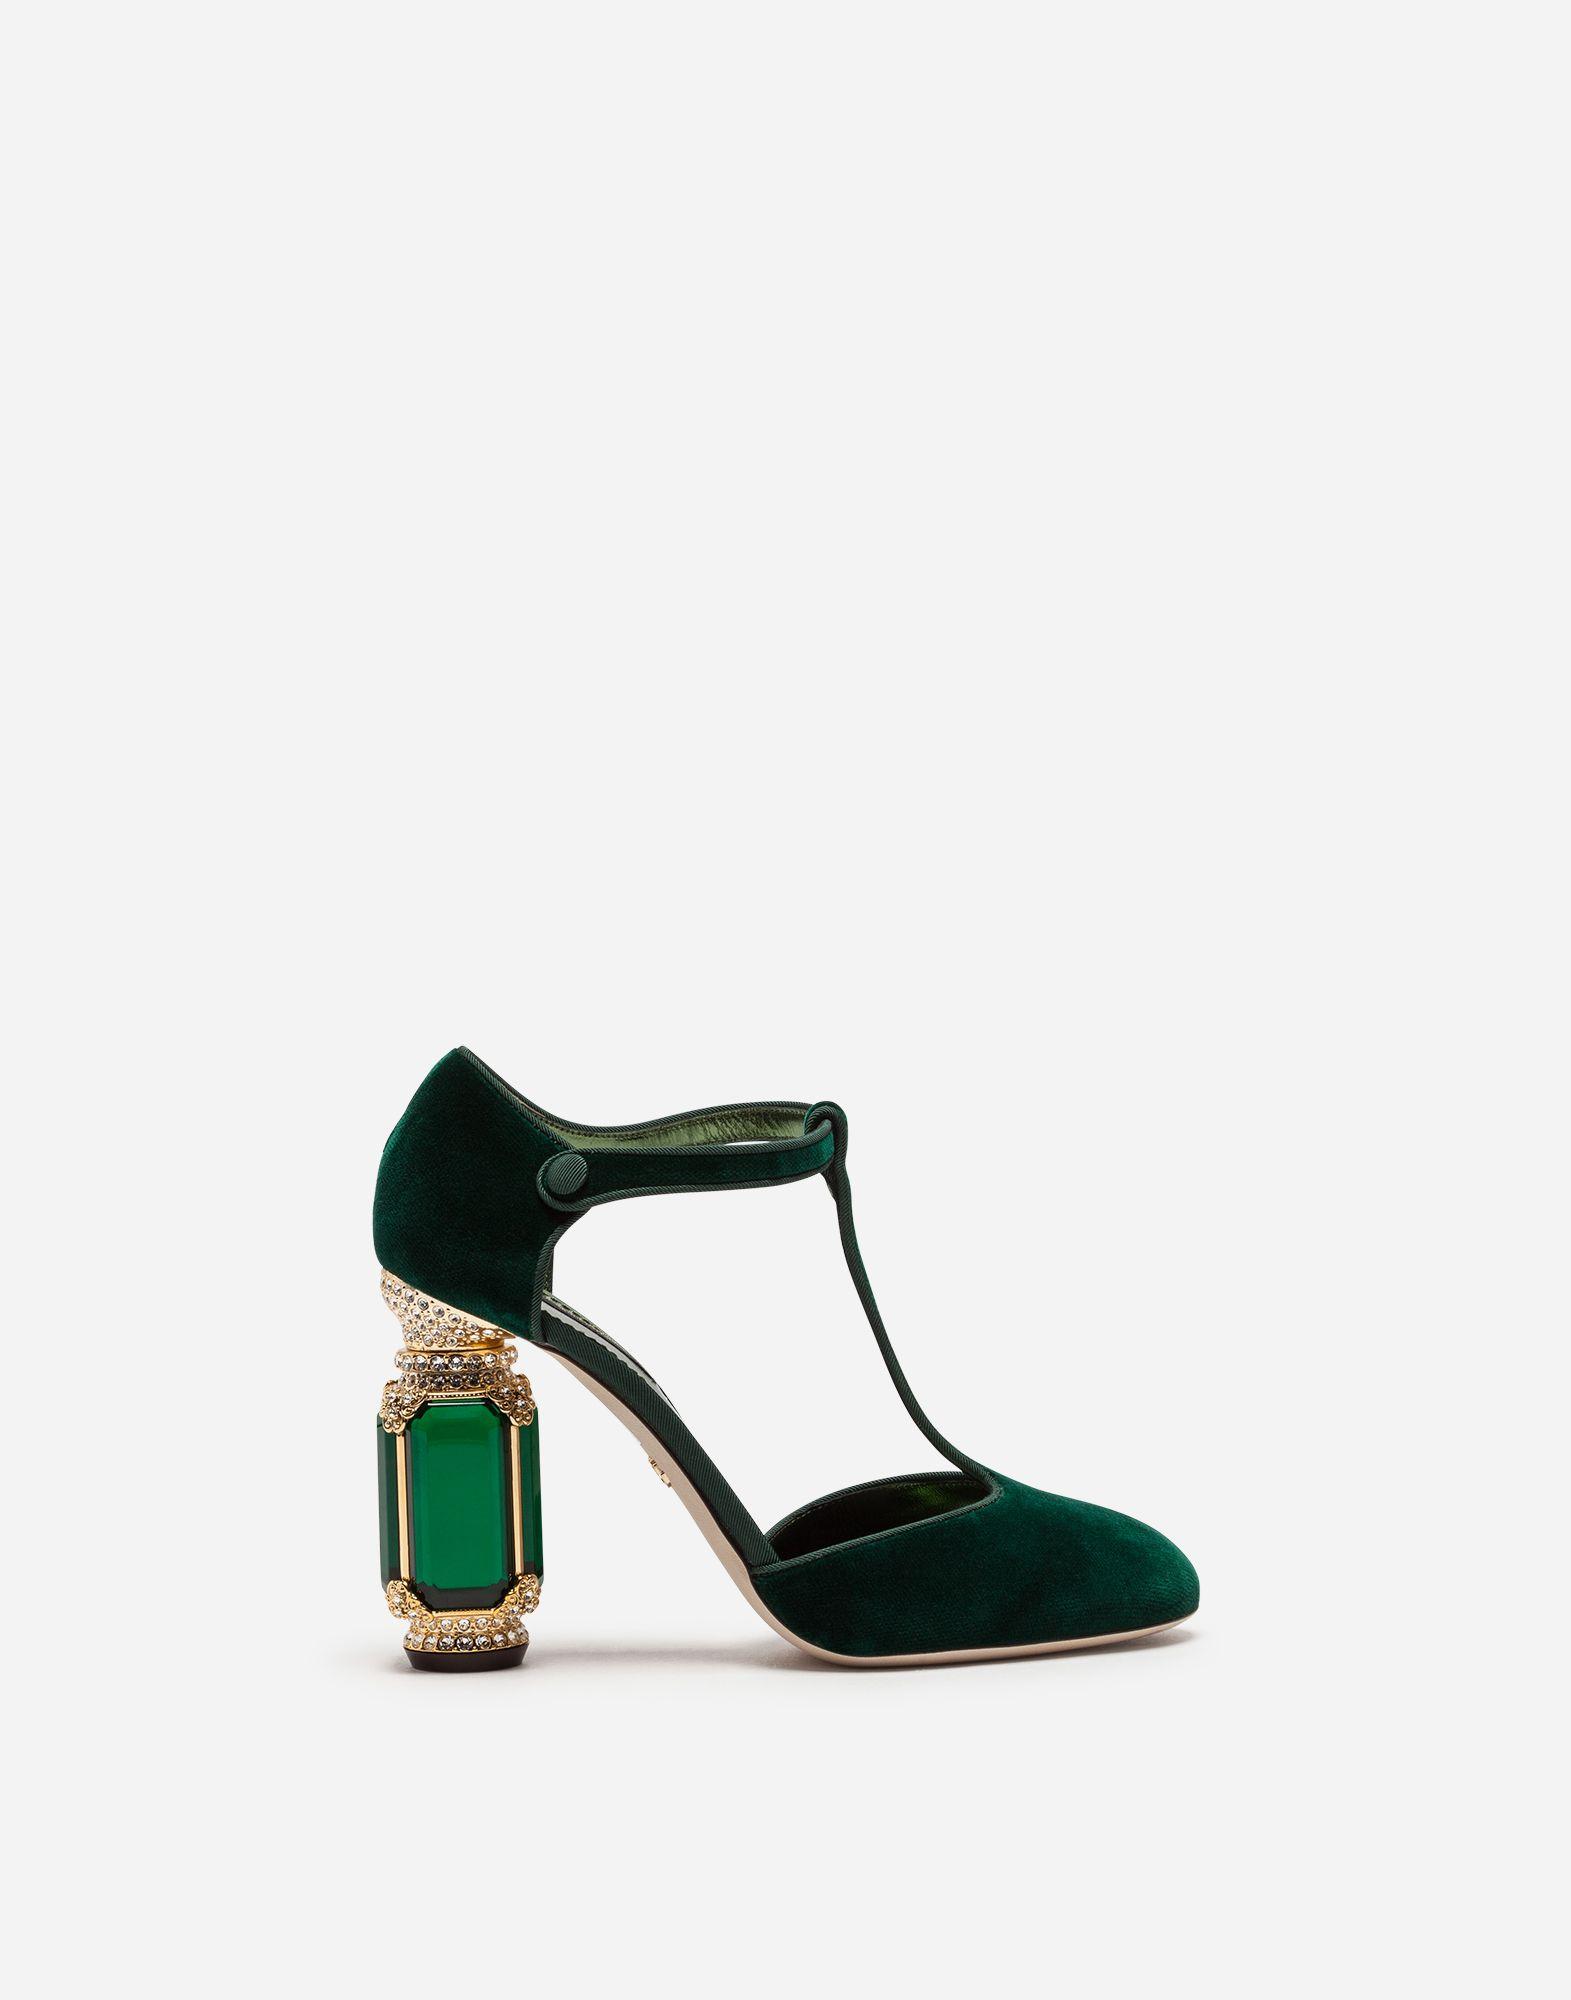 c31b51a12078 Dolce   Gabbana VELVET T-STRAPS WITH JEWEL HEEL